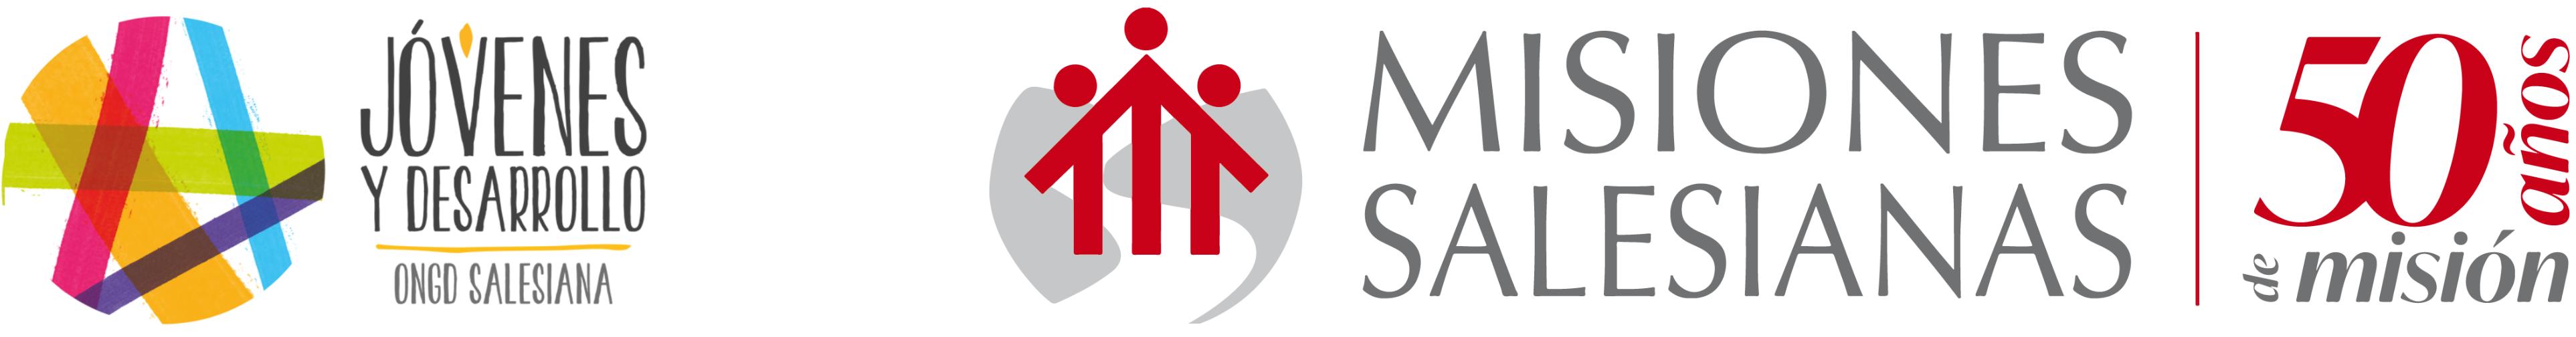 Consumo Responsable Misiones Salesianas